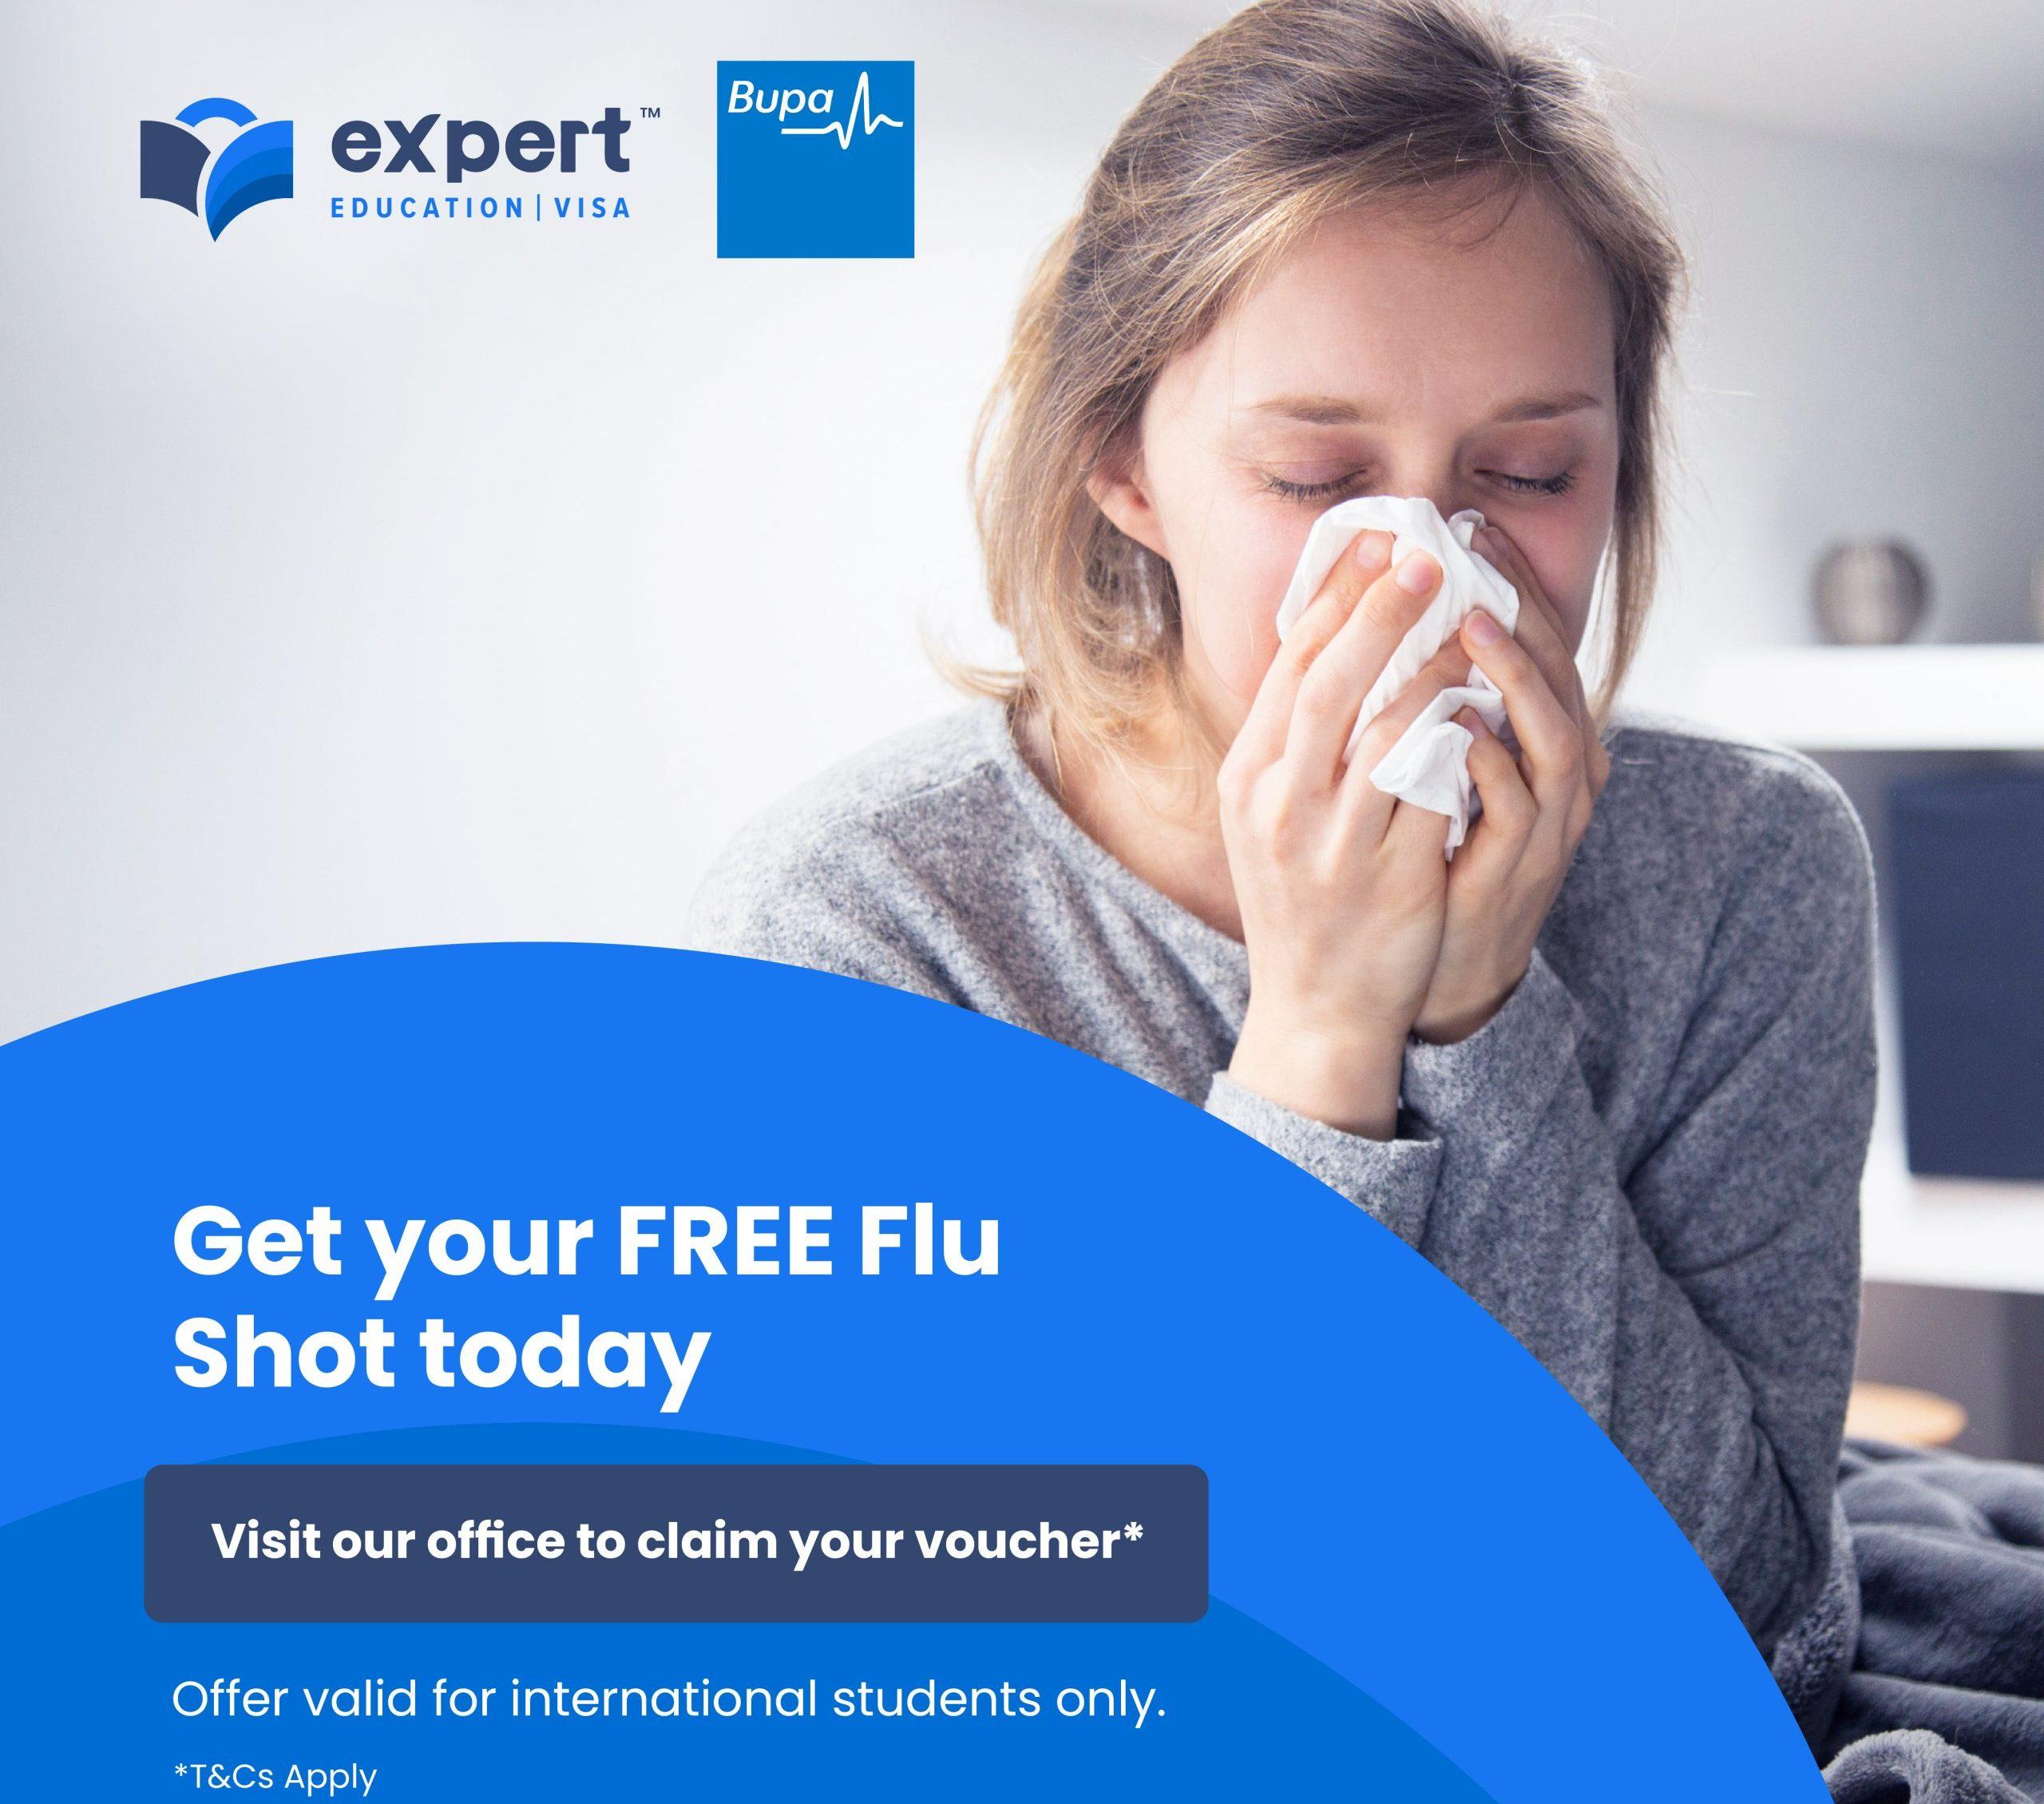 Expert Education - Free Flu Vaccination